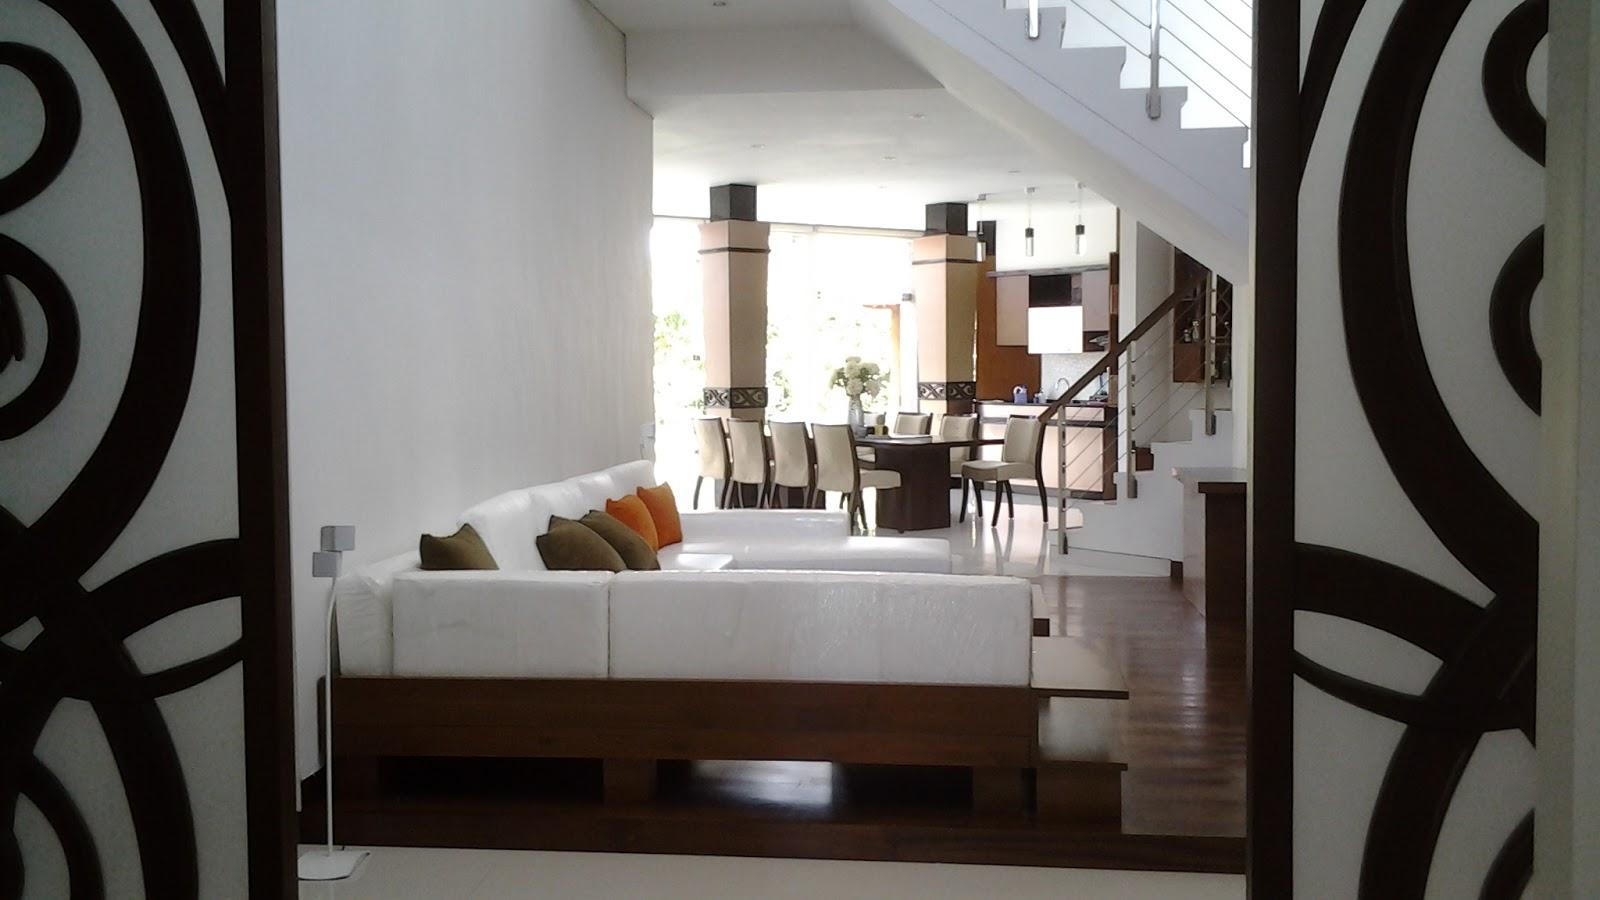 Home Furniture In Bali Cakrawala Bali Di Surabaya Angkasa Surabaya